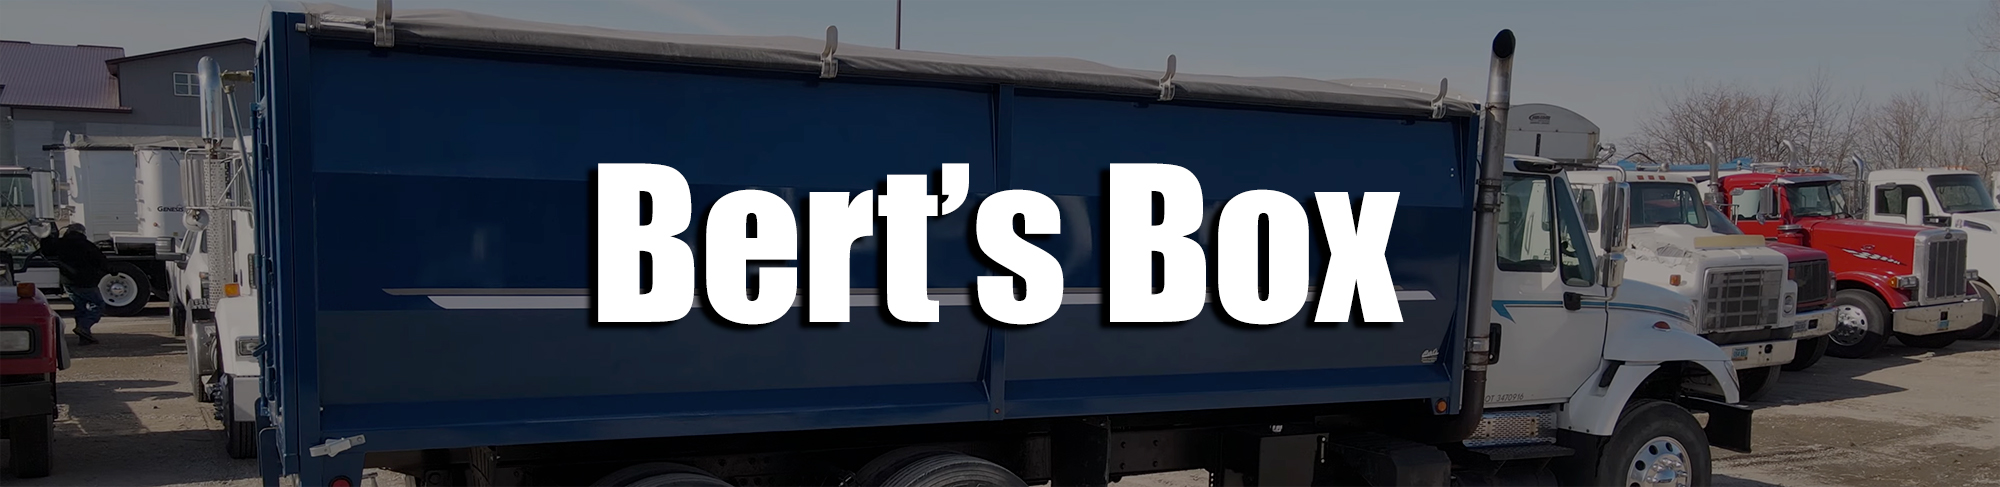 Bert's Box Header